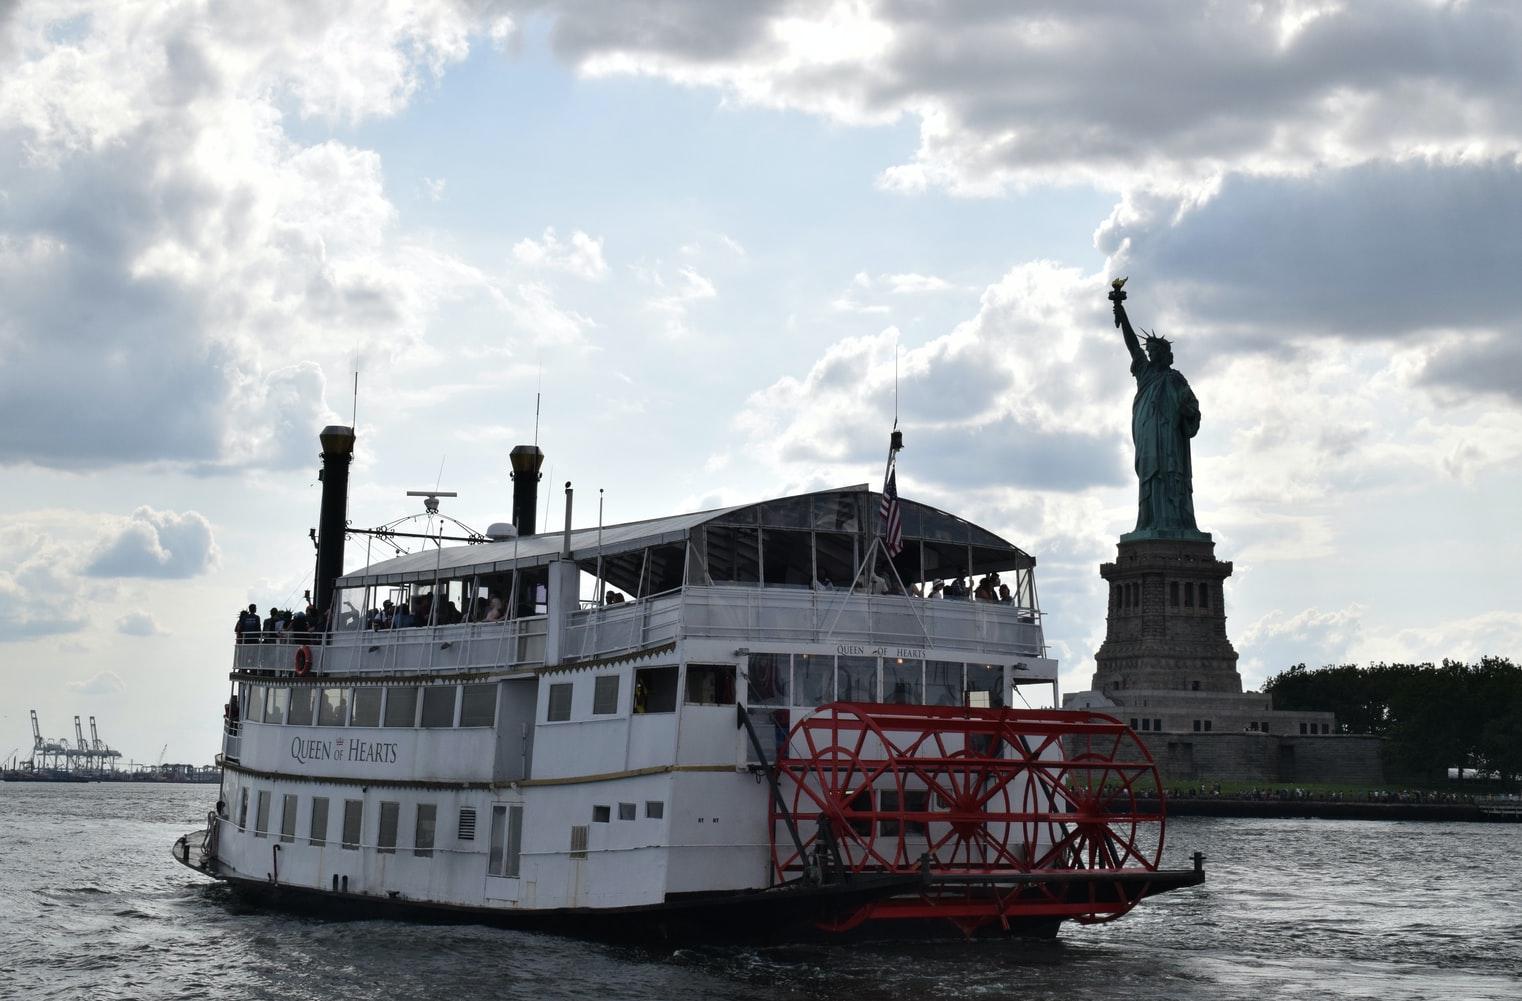 Boat Cruise Statue of Liberty